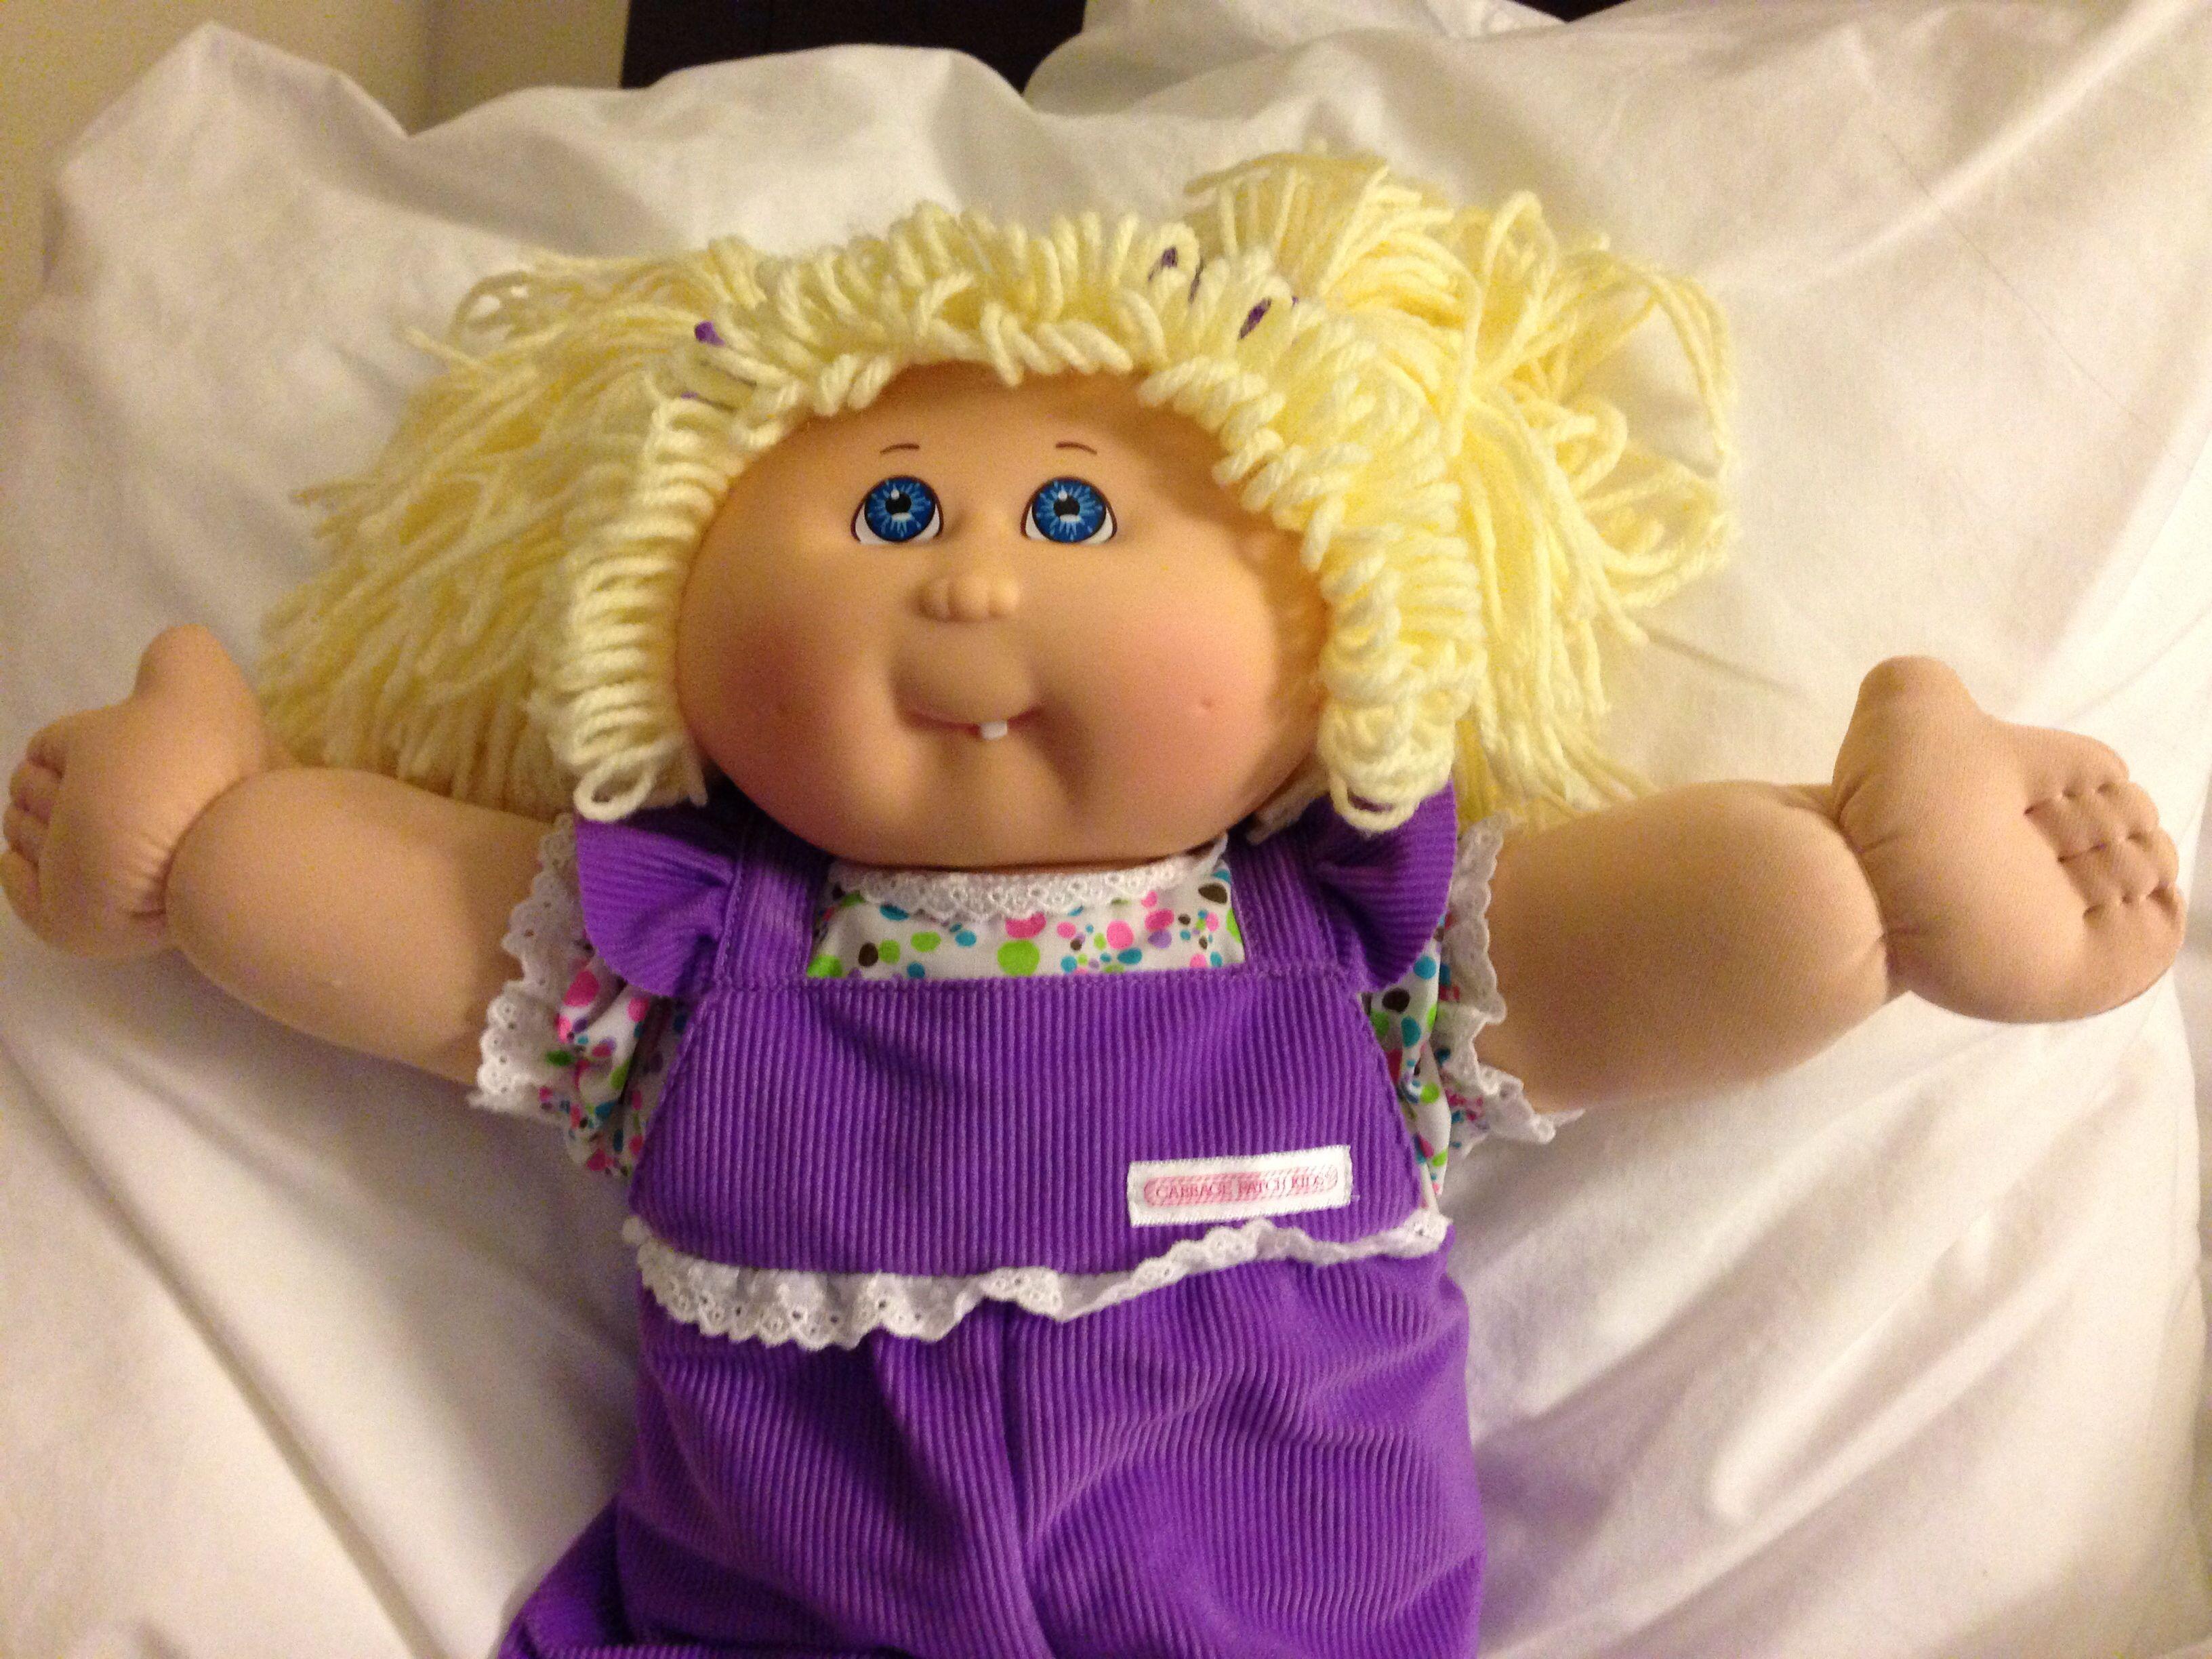 Bebé repollito!! Gabbage Patch Kids | scents i ♥ | Pinterest